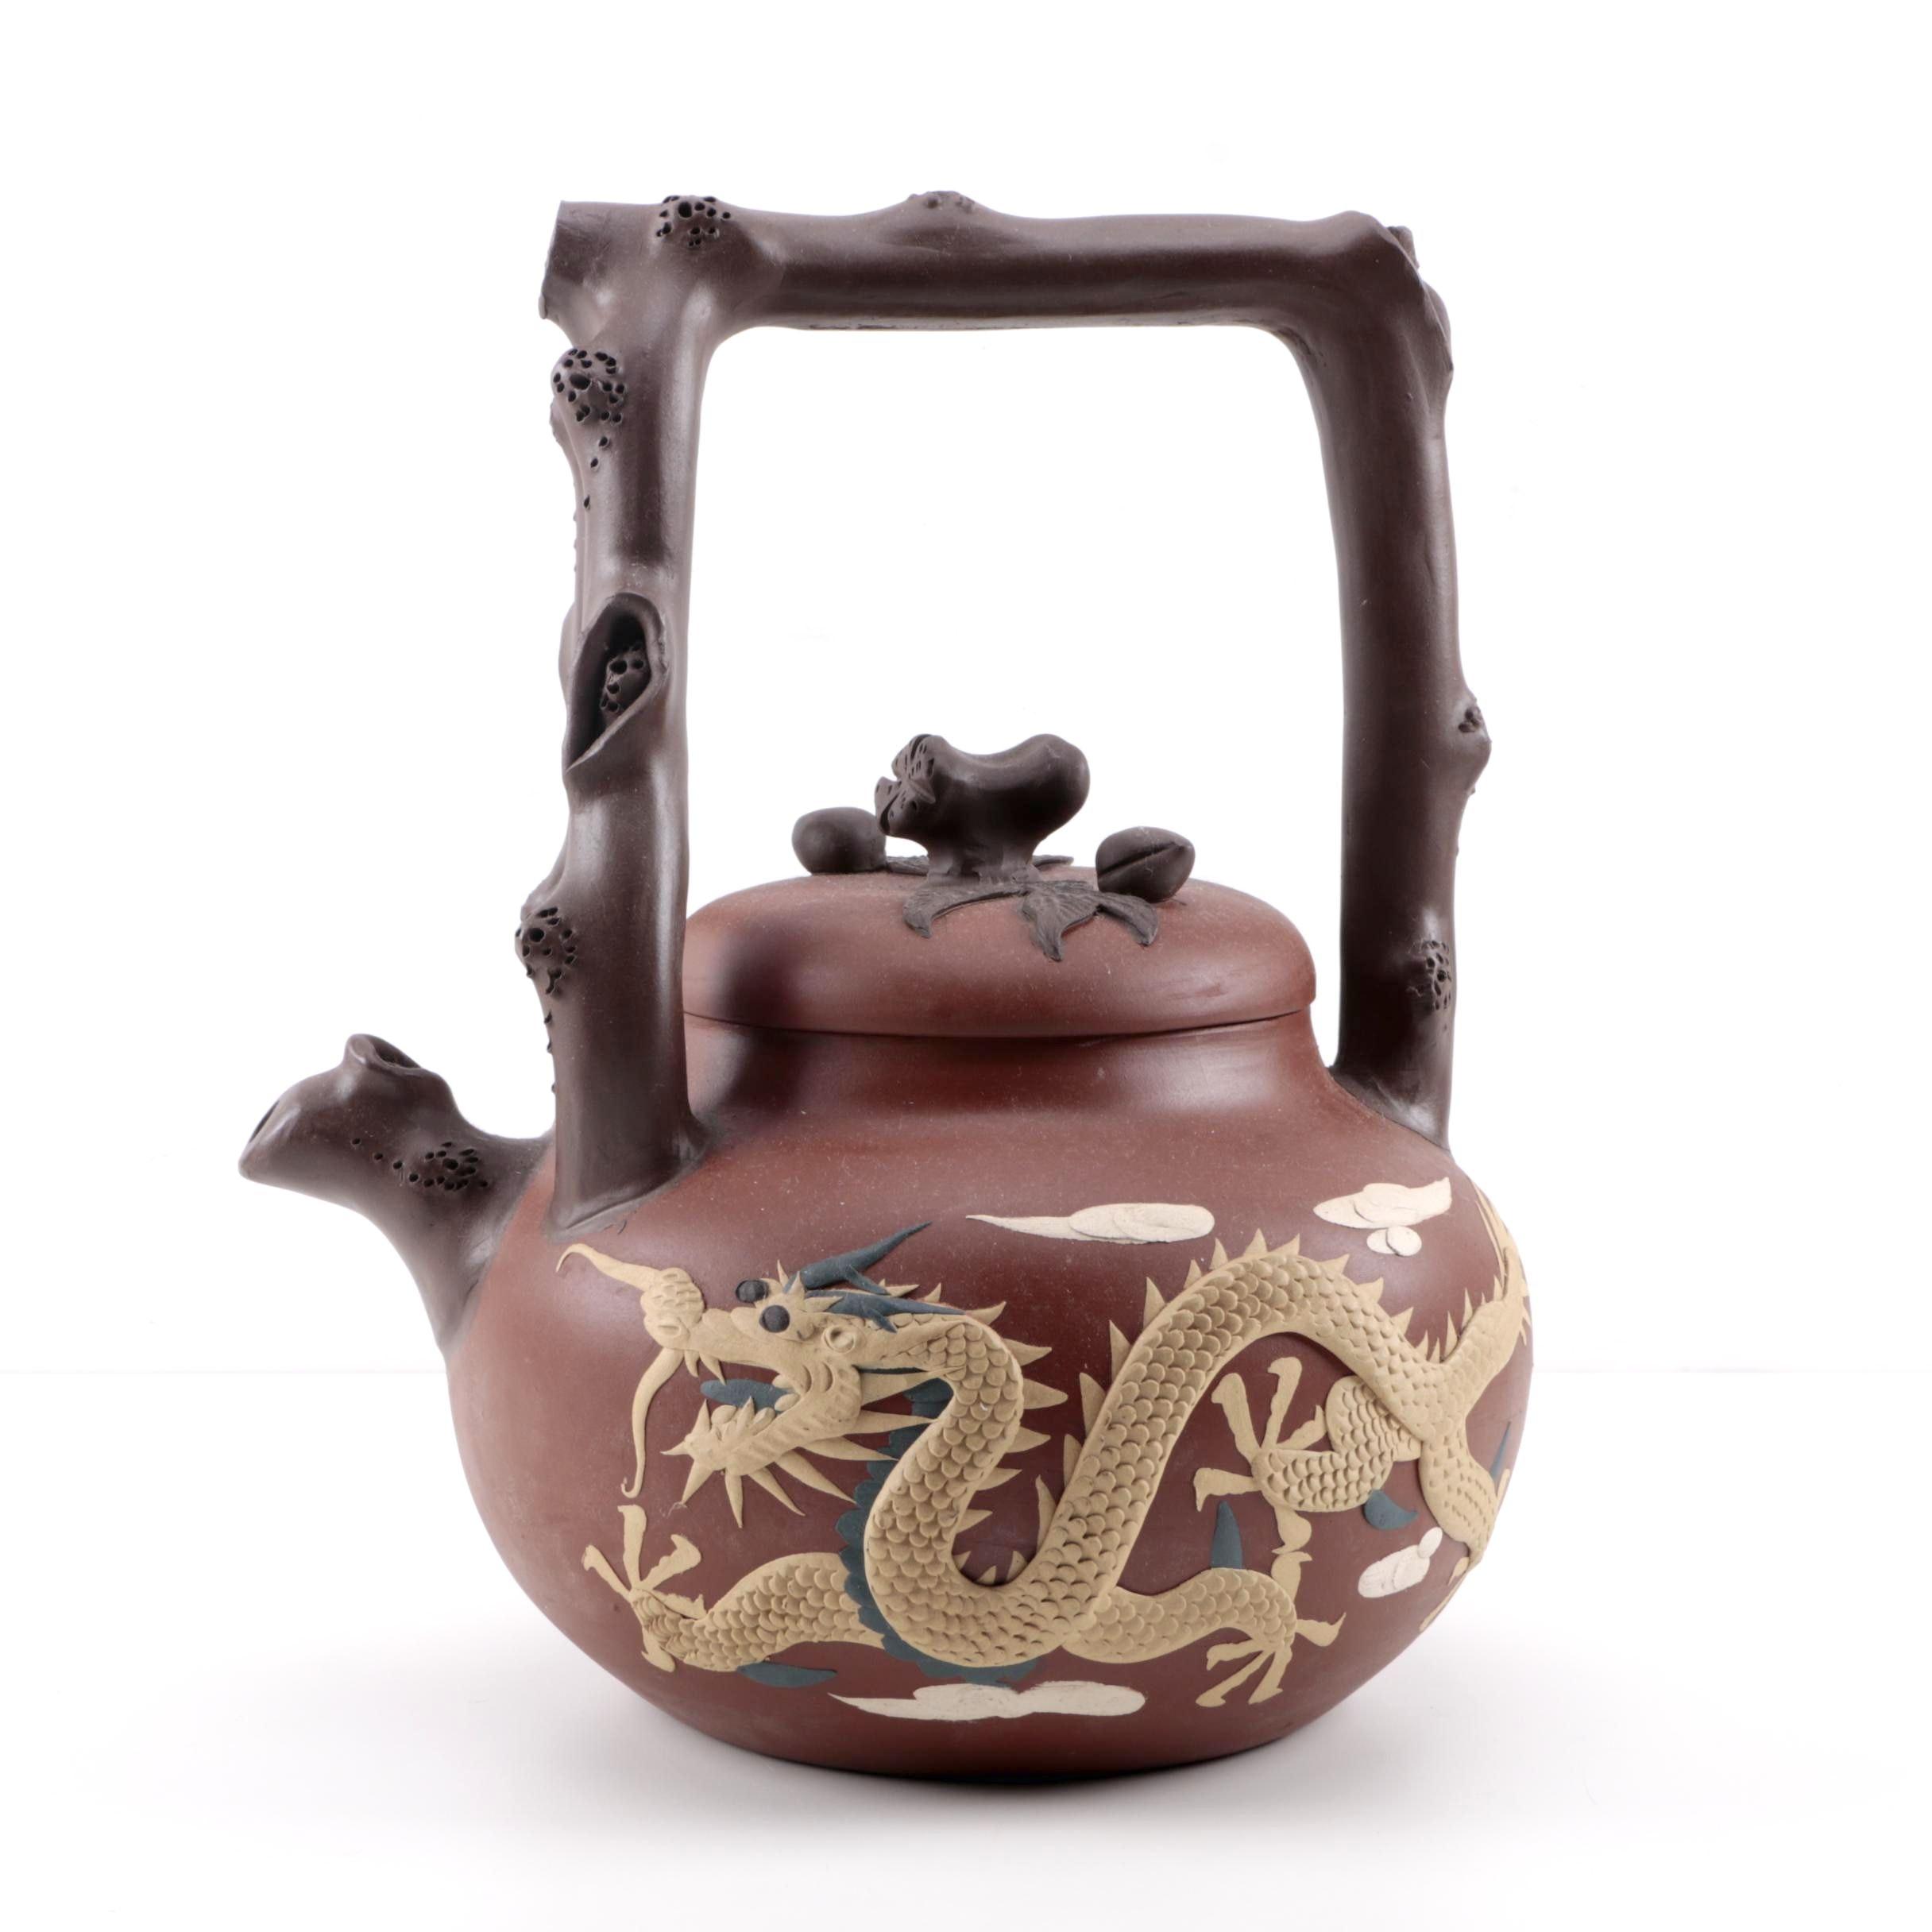 Decorative Chinese Stoneware Teapot